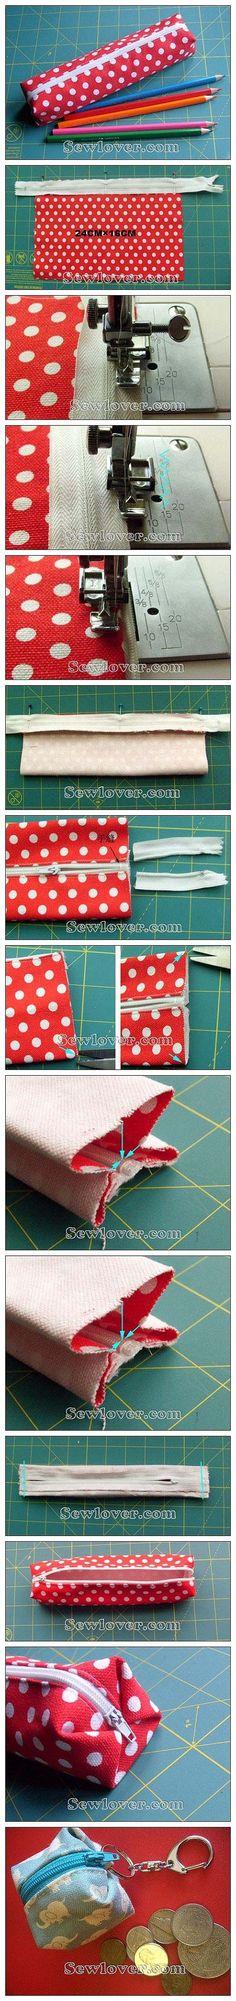 DIY pencil bag or cube coin bag with zipper! very cute! :D tolltartó Sewing Hacks, Sewing Tutorials, Sewing Patterns, Fabric Crafts, Sewing Crafts, Sewing Projects, Diy Crafts, Pencil Bags, Pencil Pouch